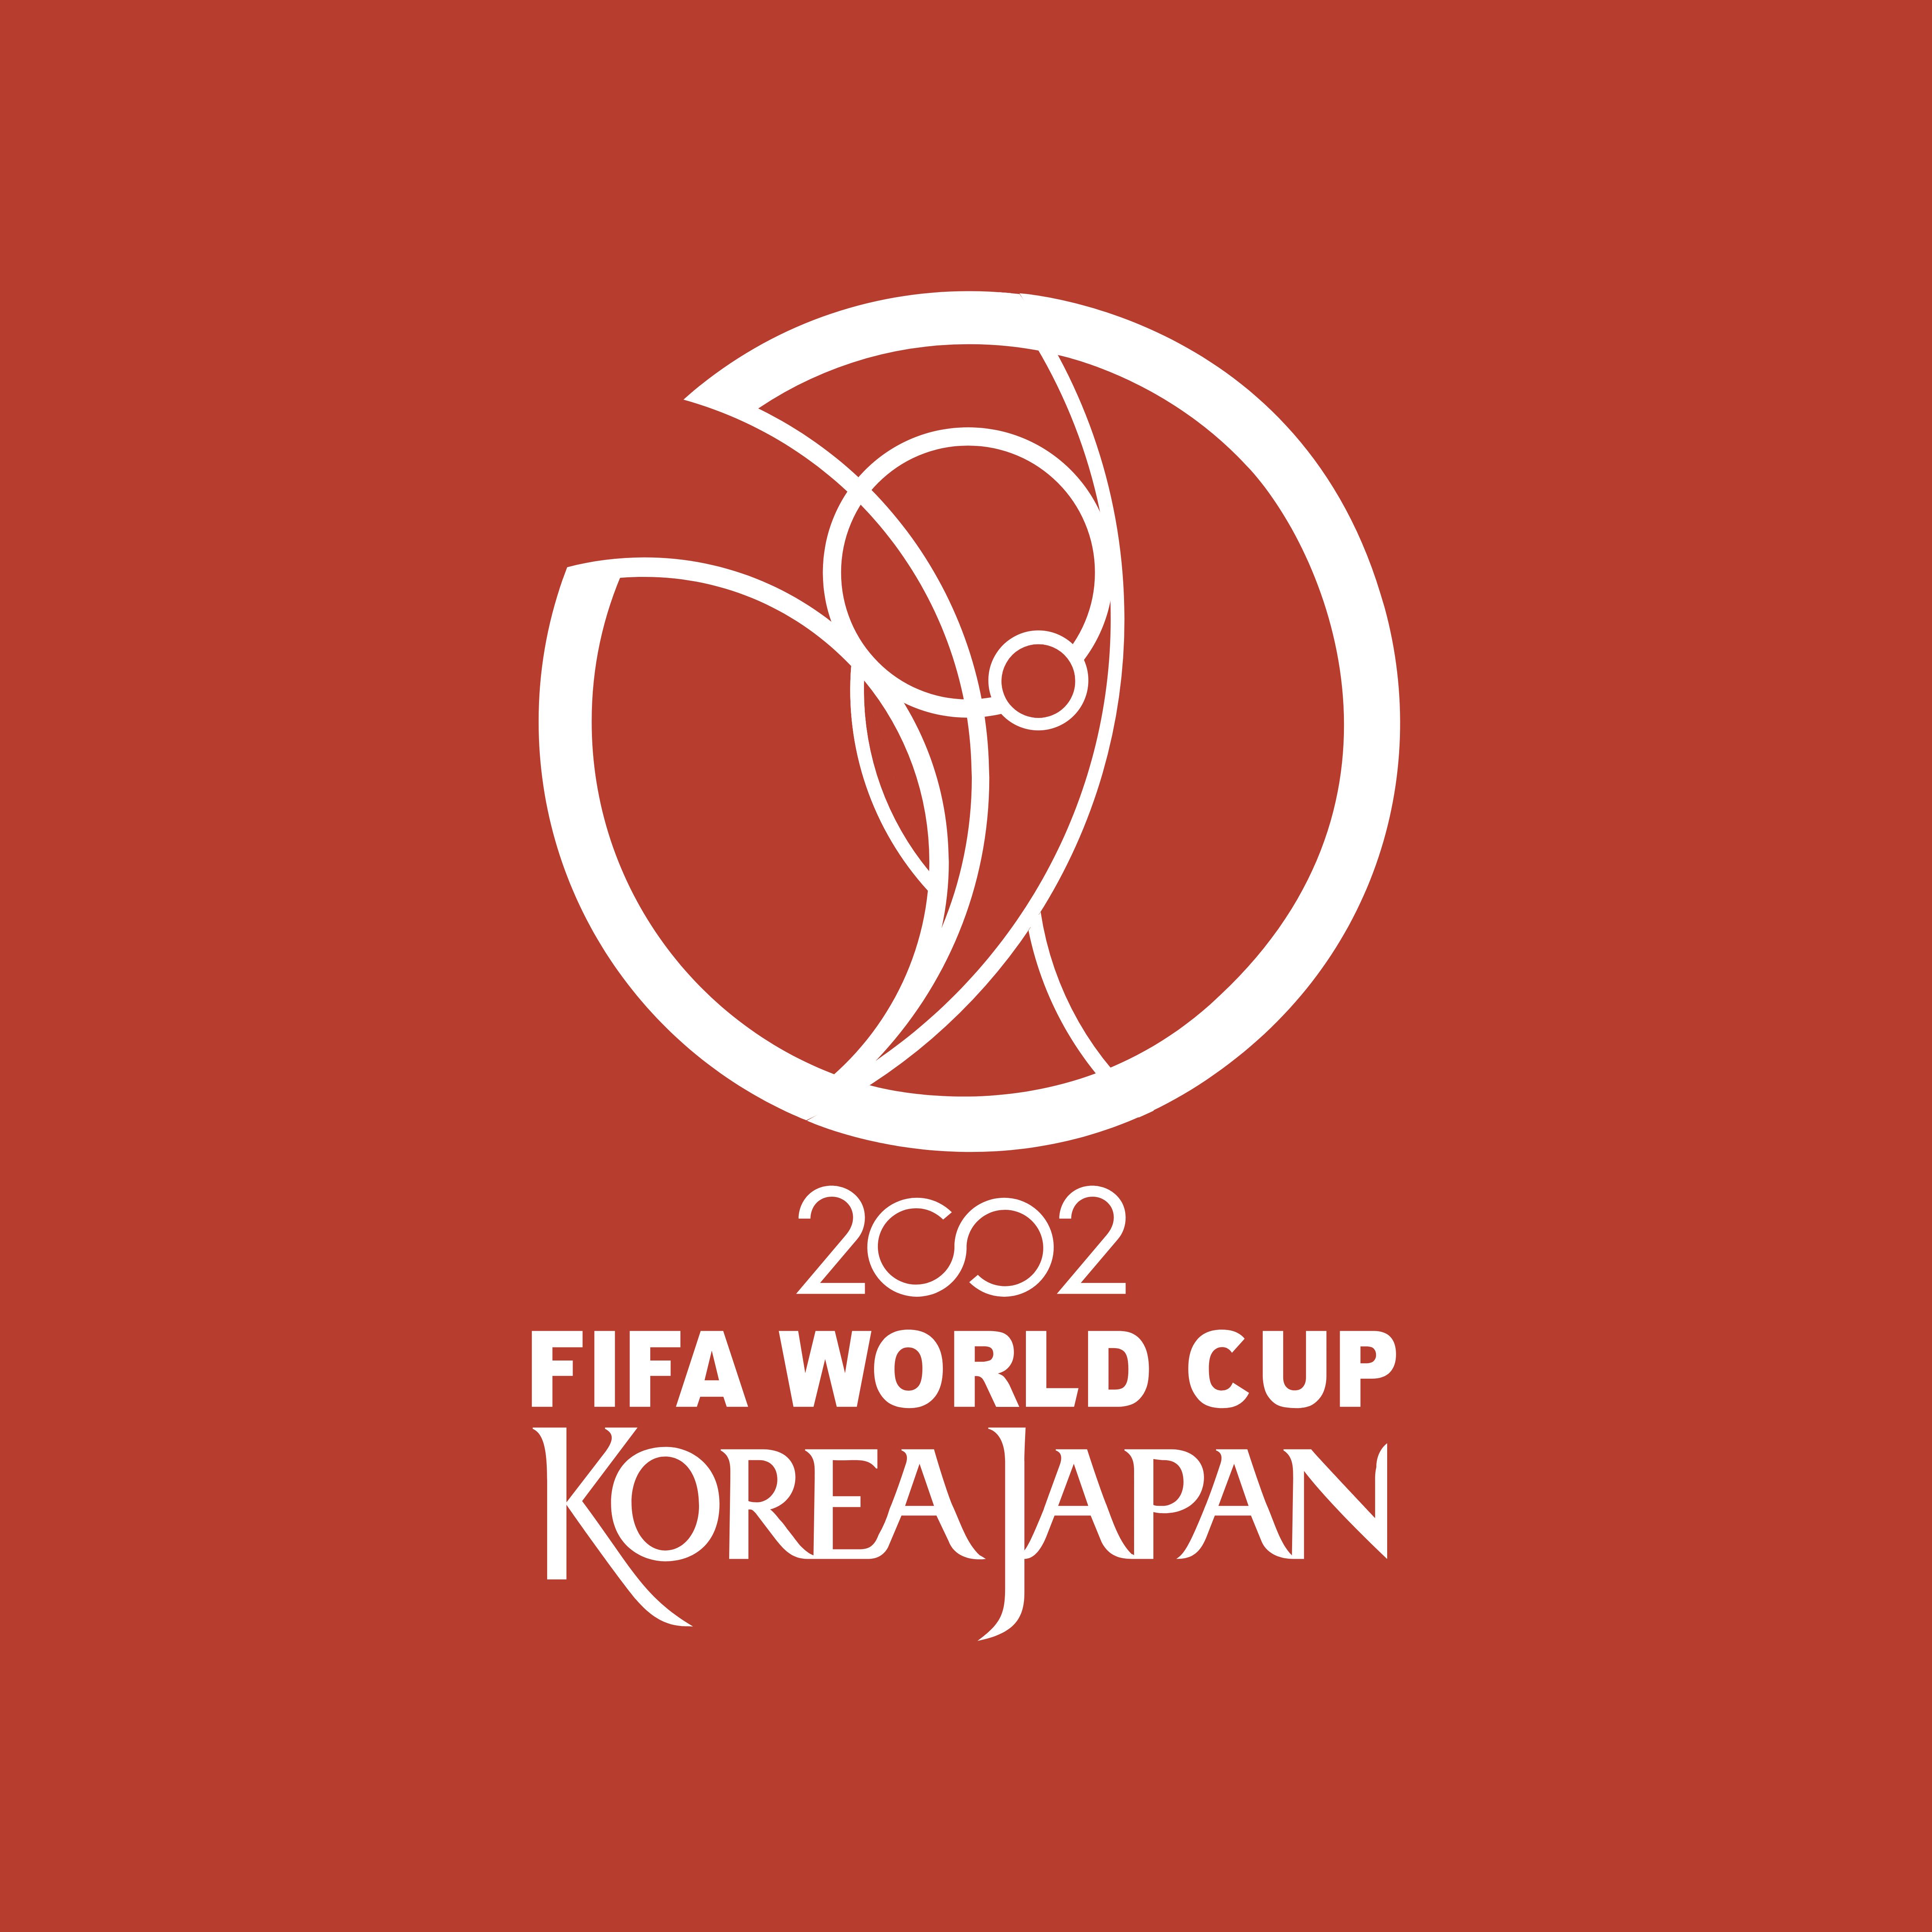 fifa world cup � logos download